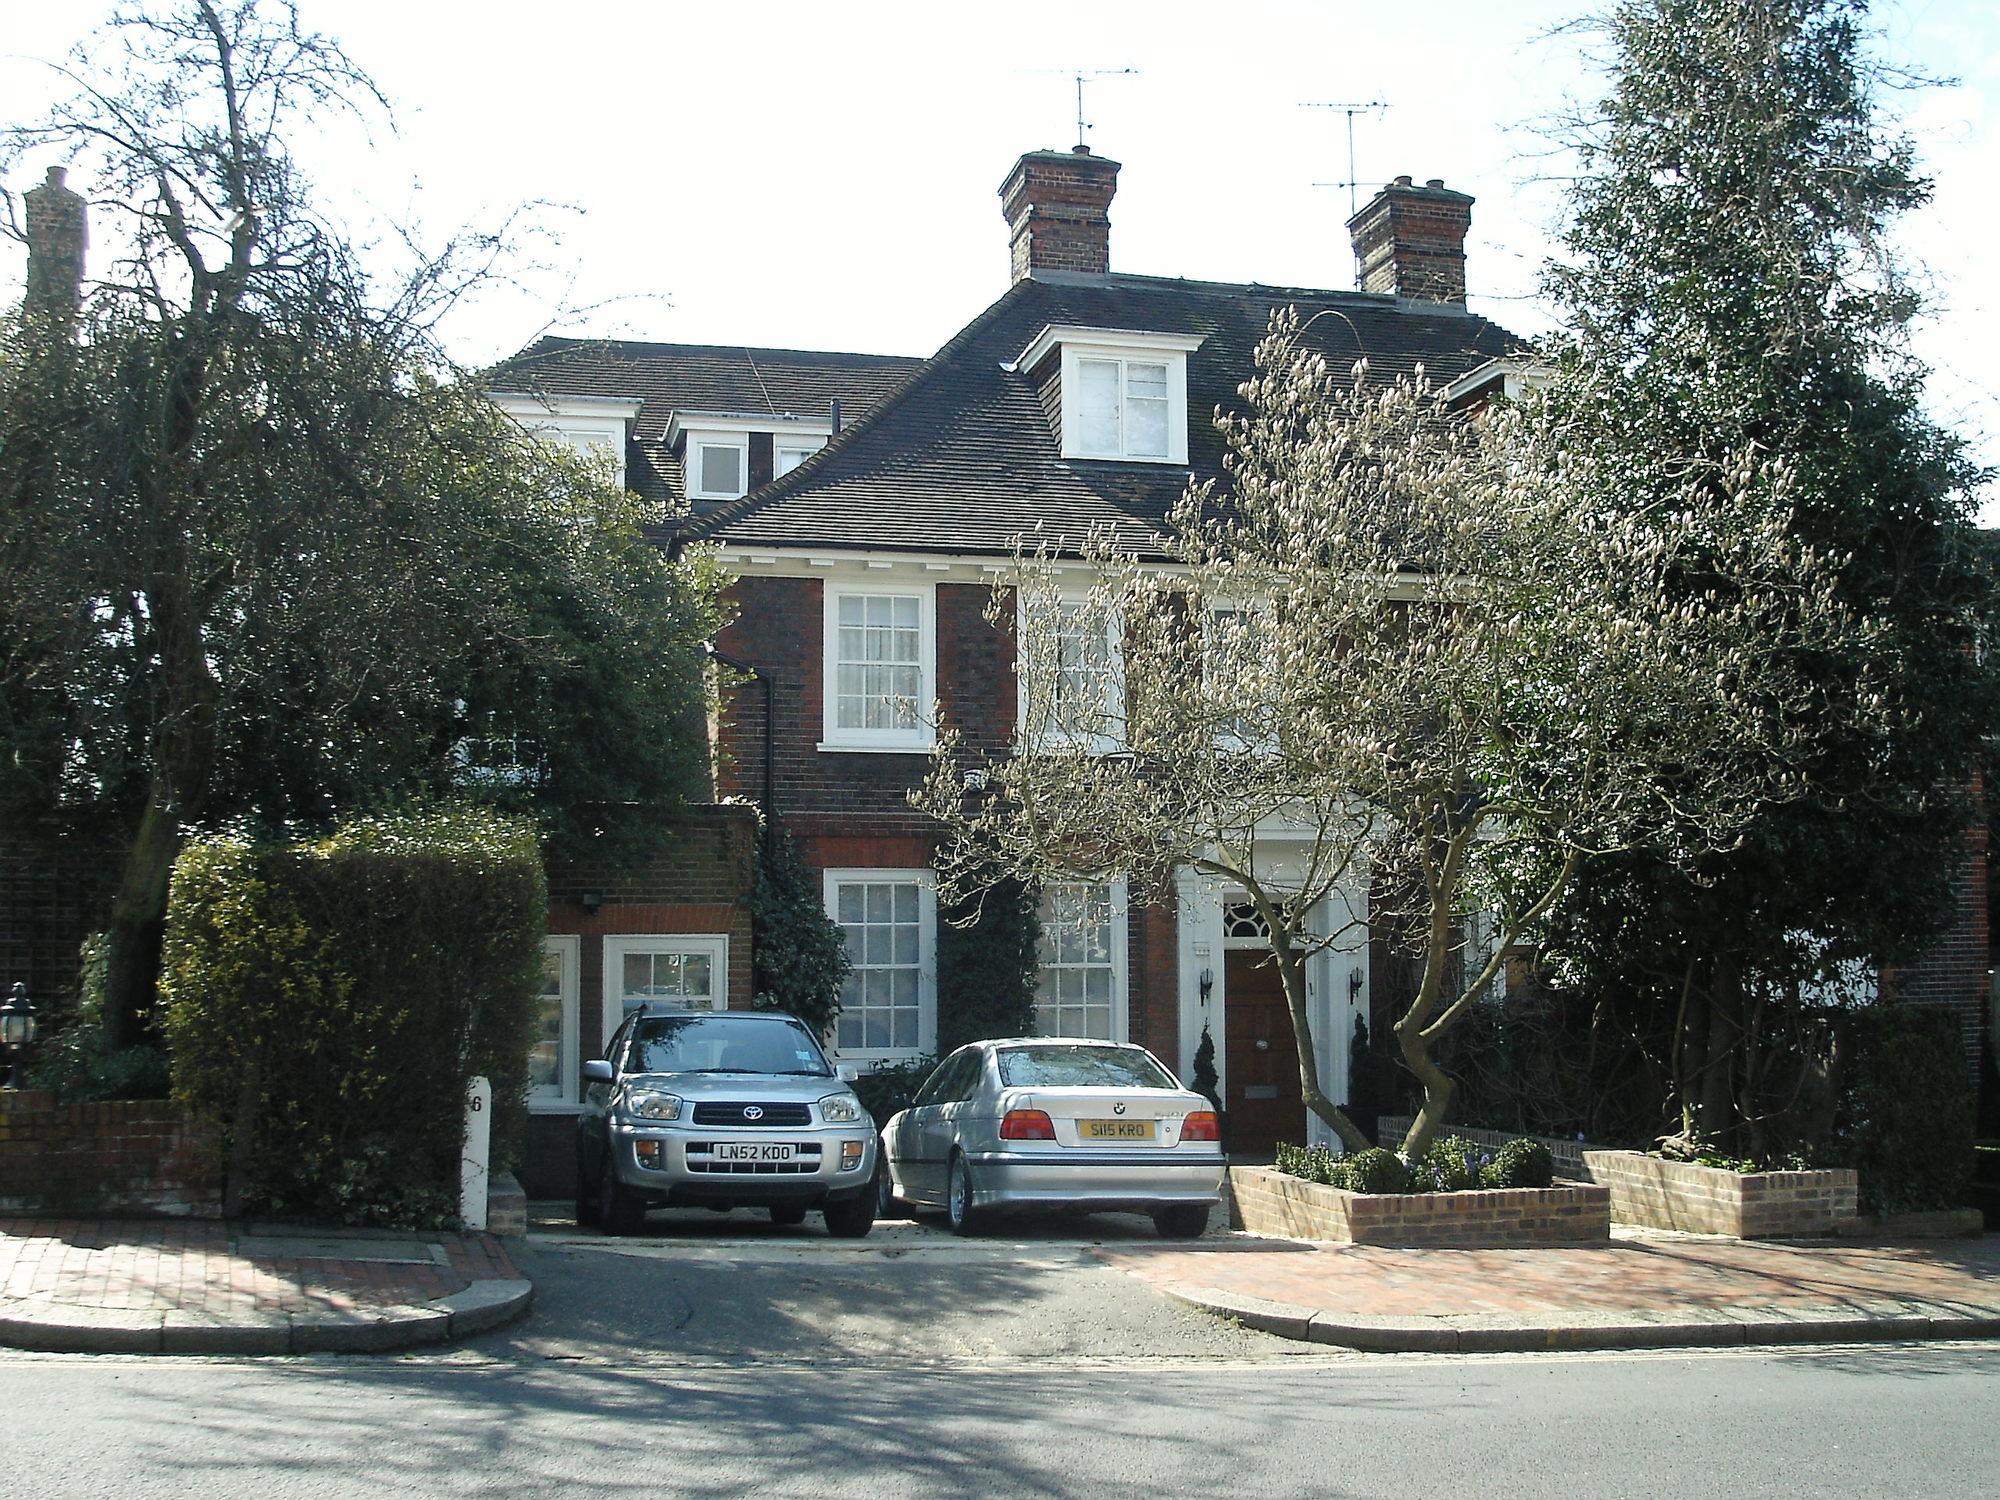 Greenaway Gardens, London, NW3